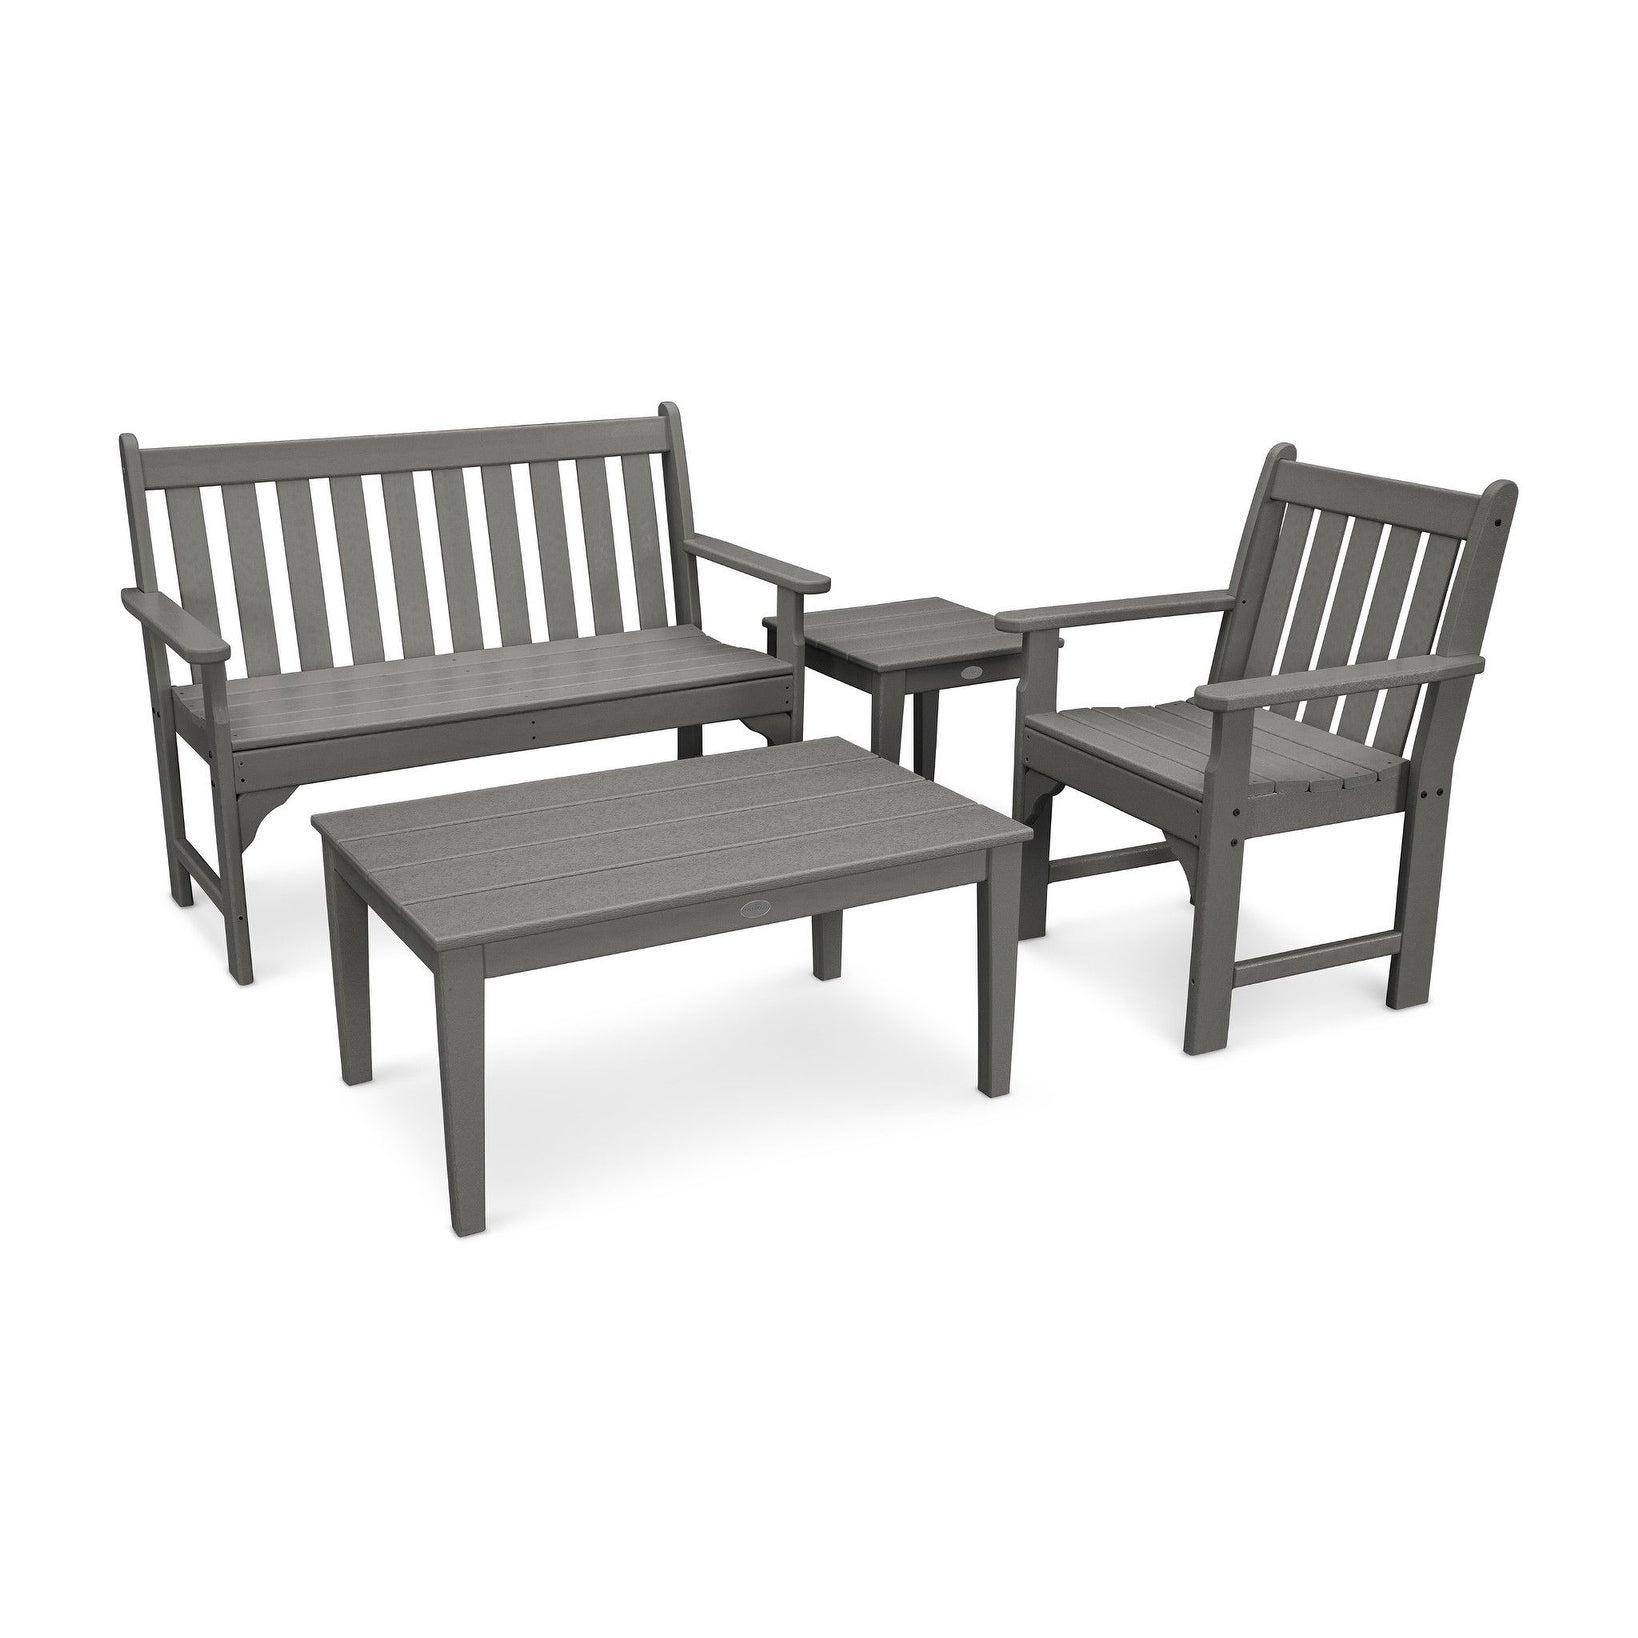 Magnificent Polywood Vineyard 4 Piece Outdoor Bench Chair And Table Set Frankydiablos Diy Chair Ideas Frankydiabloscom